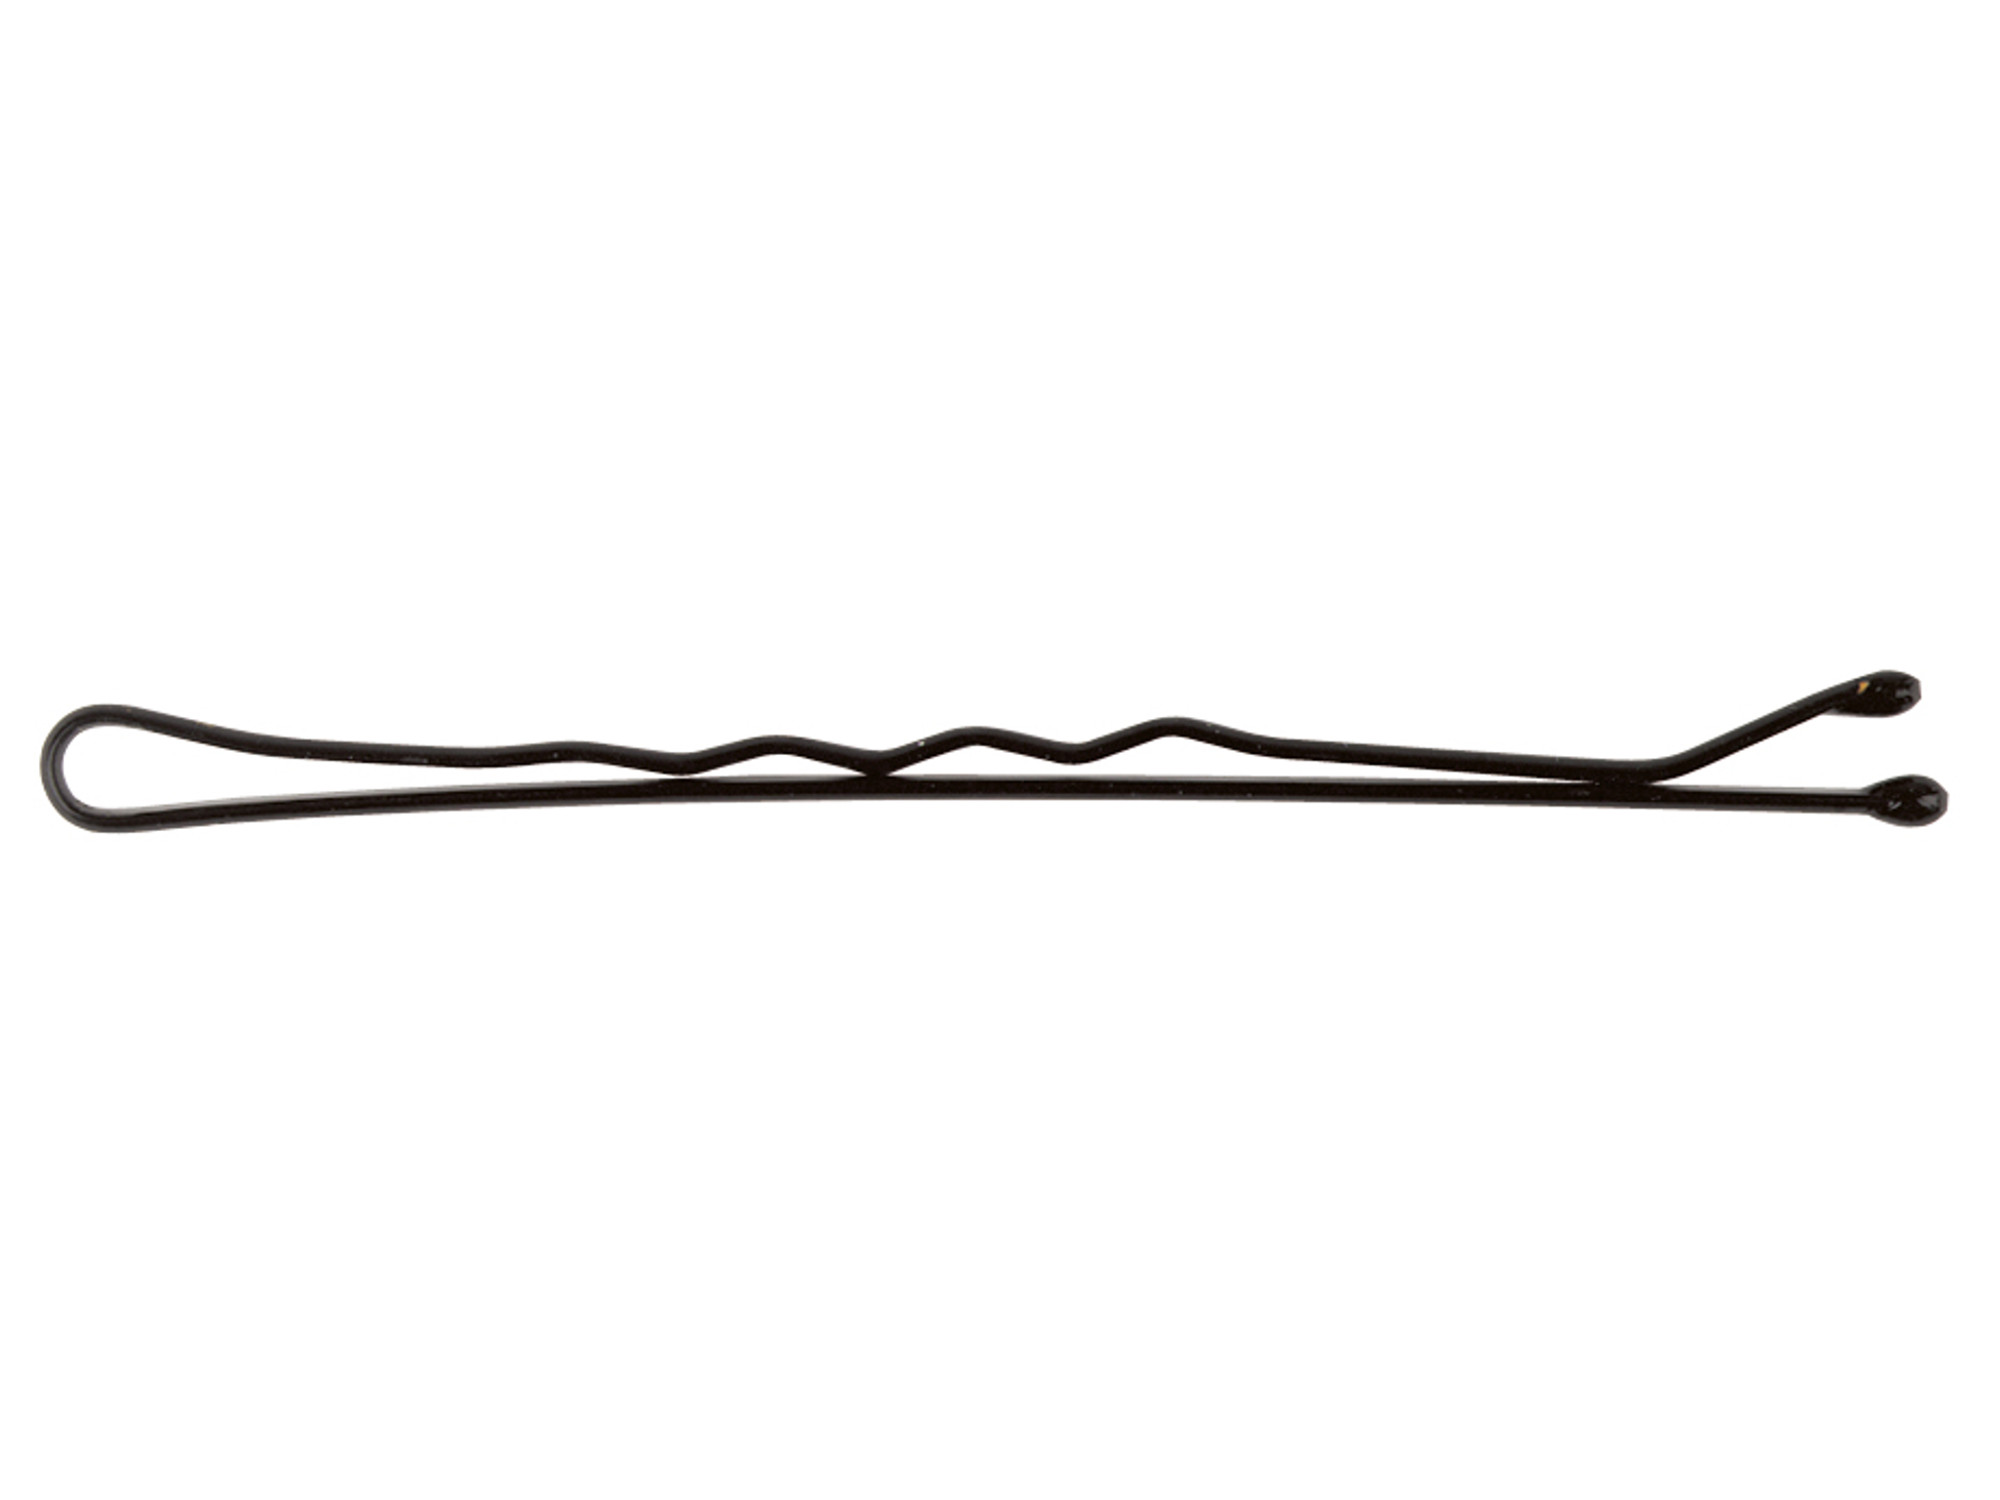 Vlnitá sponka Sibel Wavy - 5 cm, černá - 24ks (9400050-02)